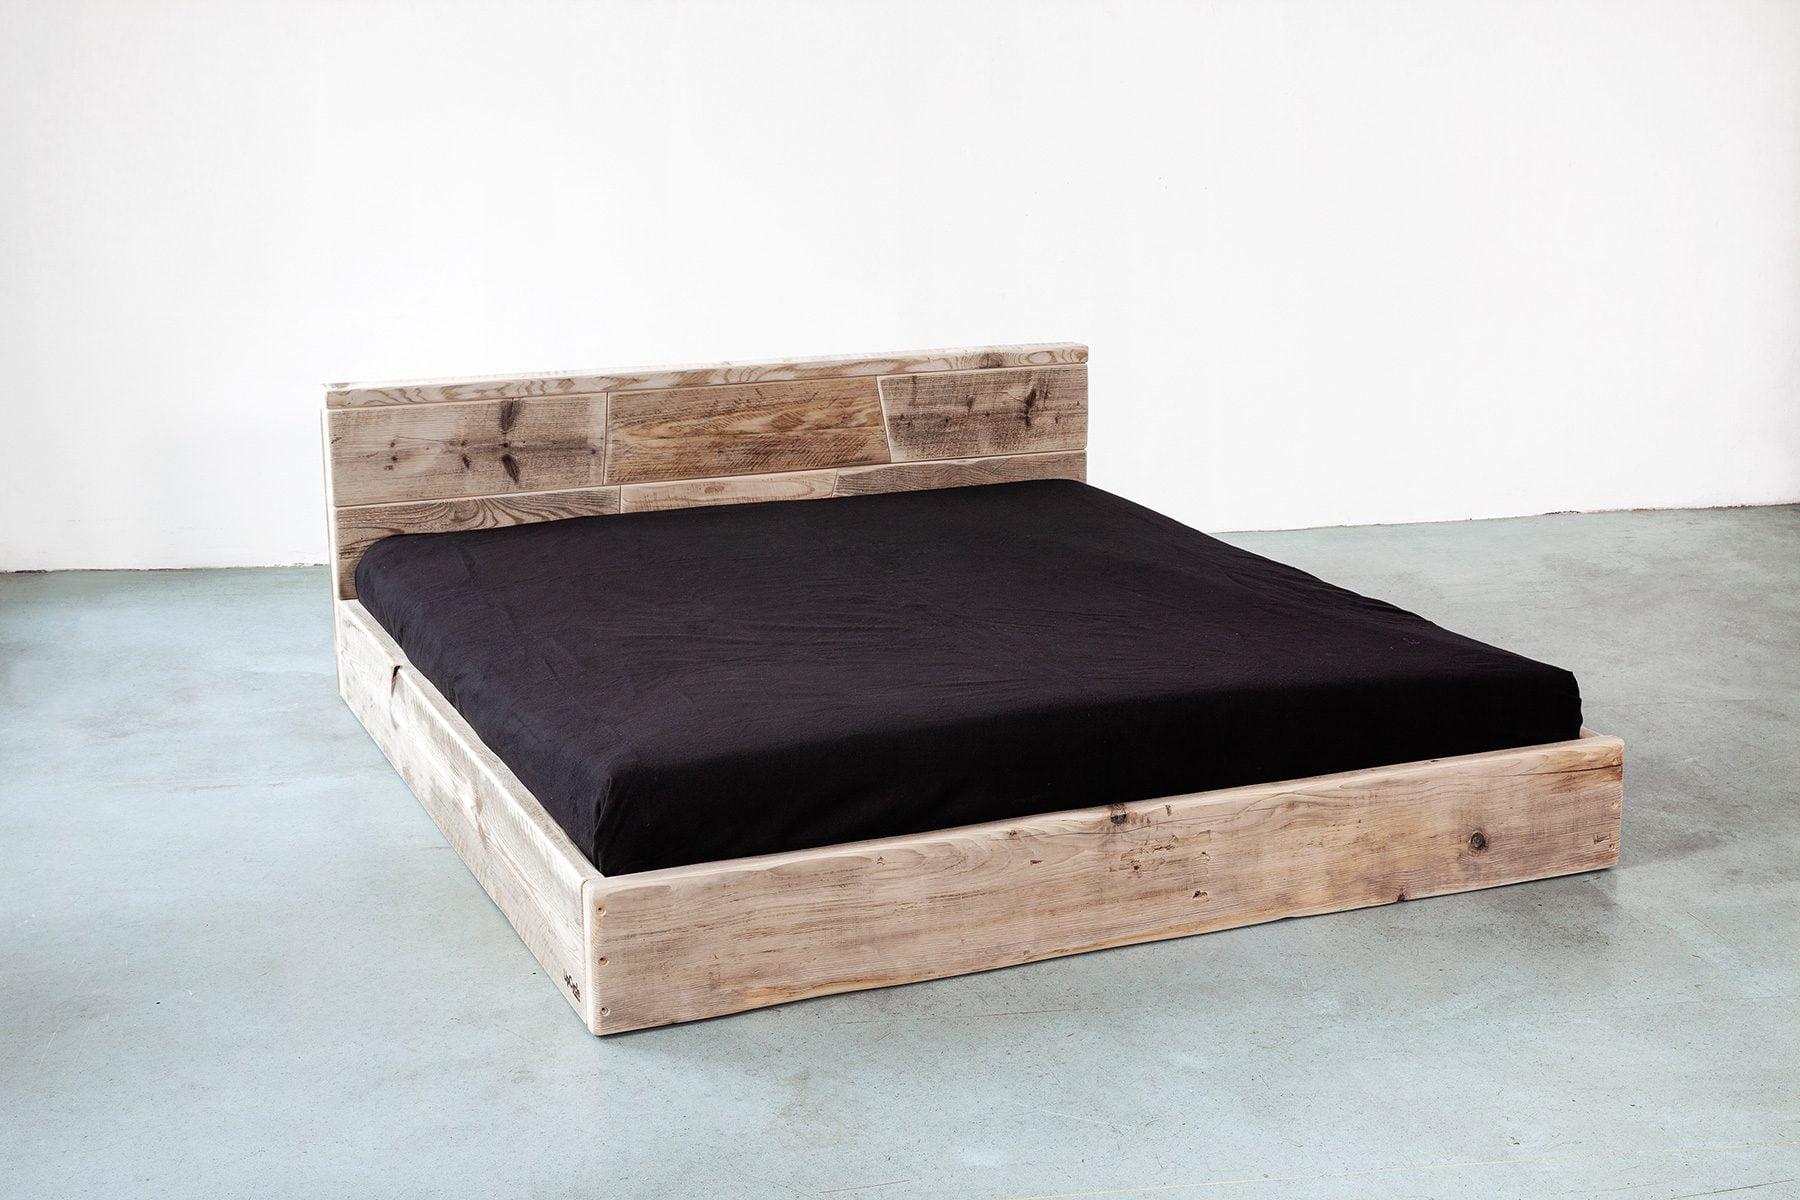 Massivholz Bett mit großer Lehne Kopfteil aus Bauholz nach Mass UpCycle Berlin